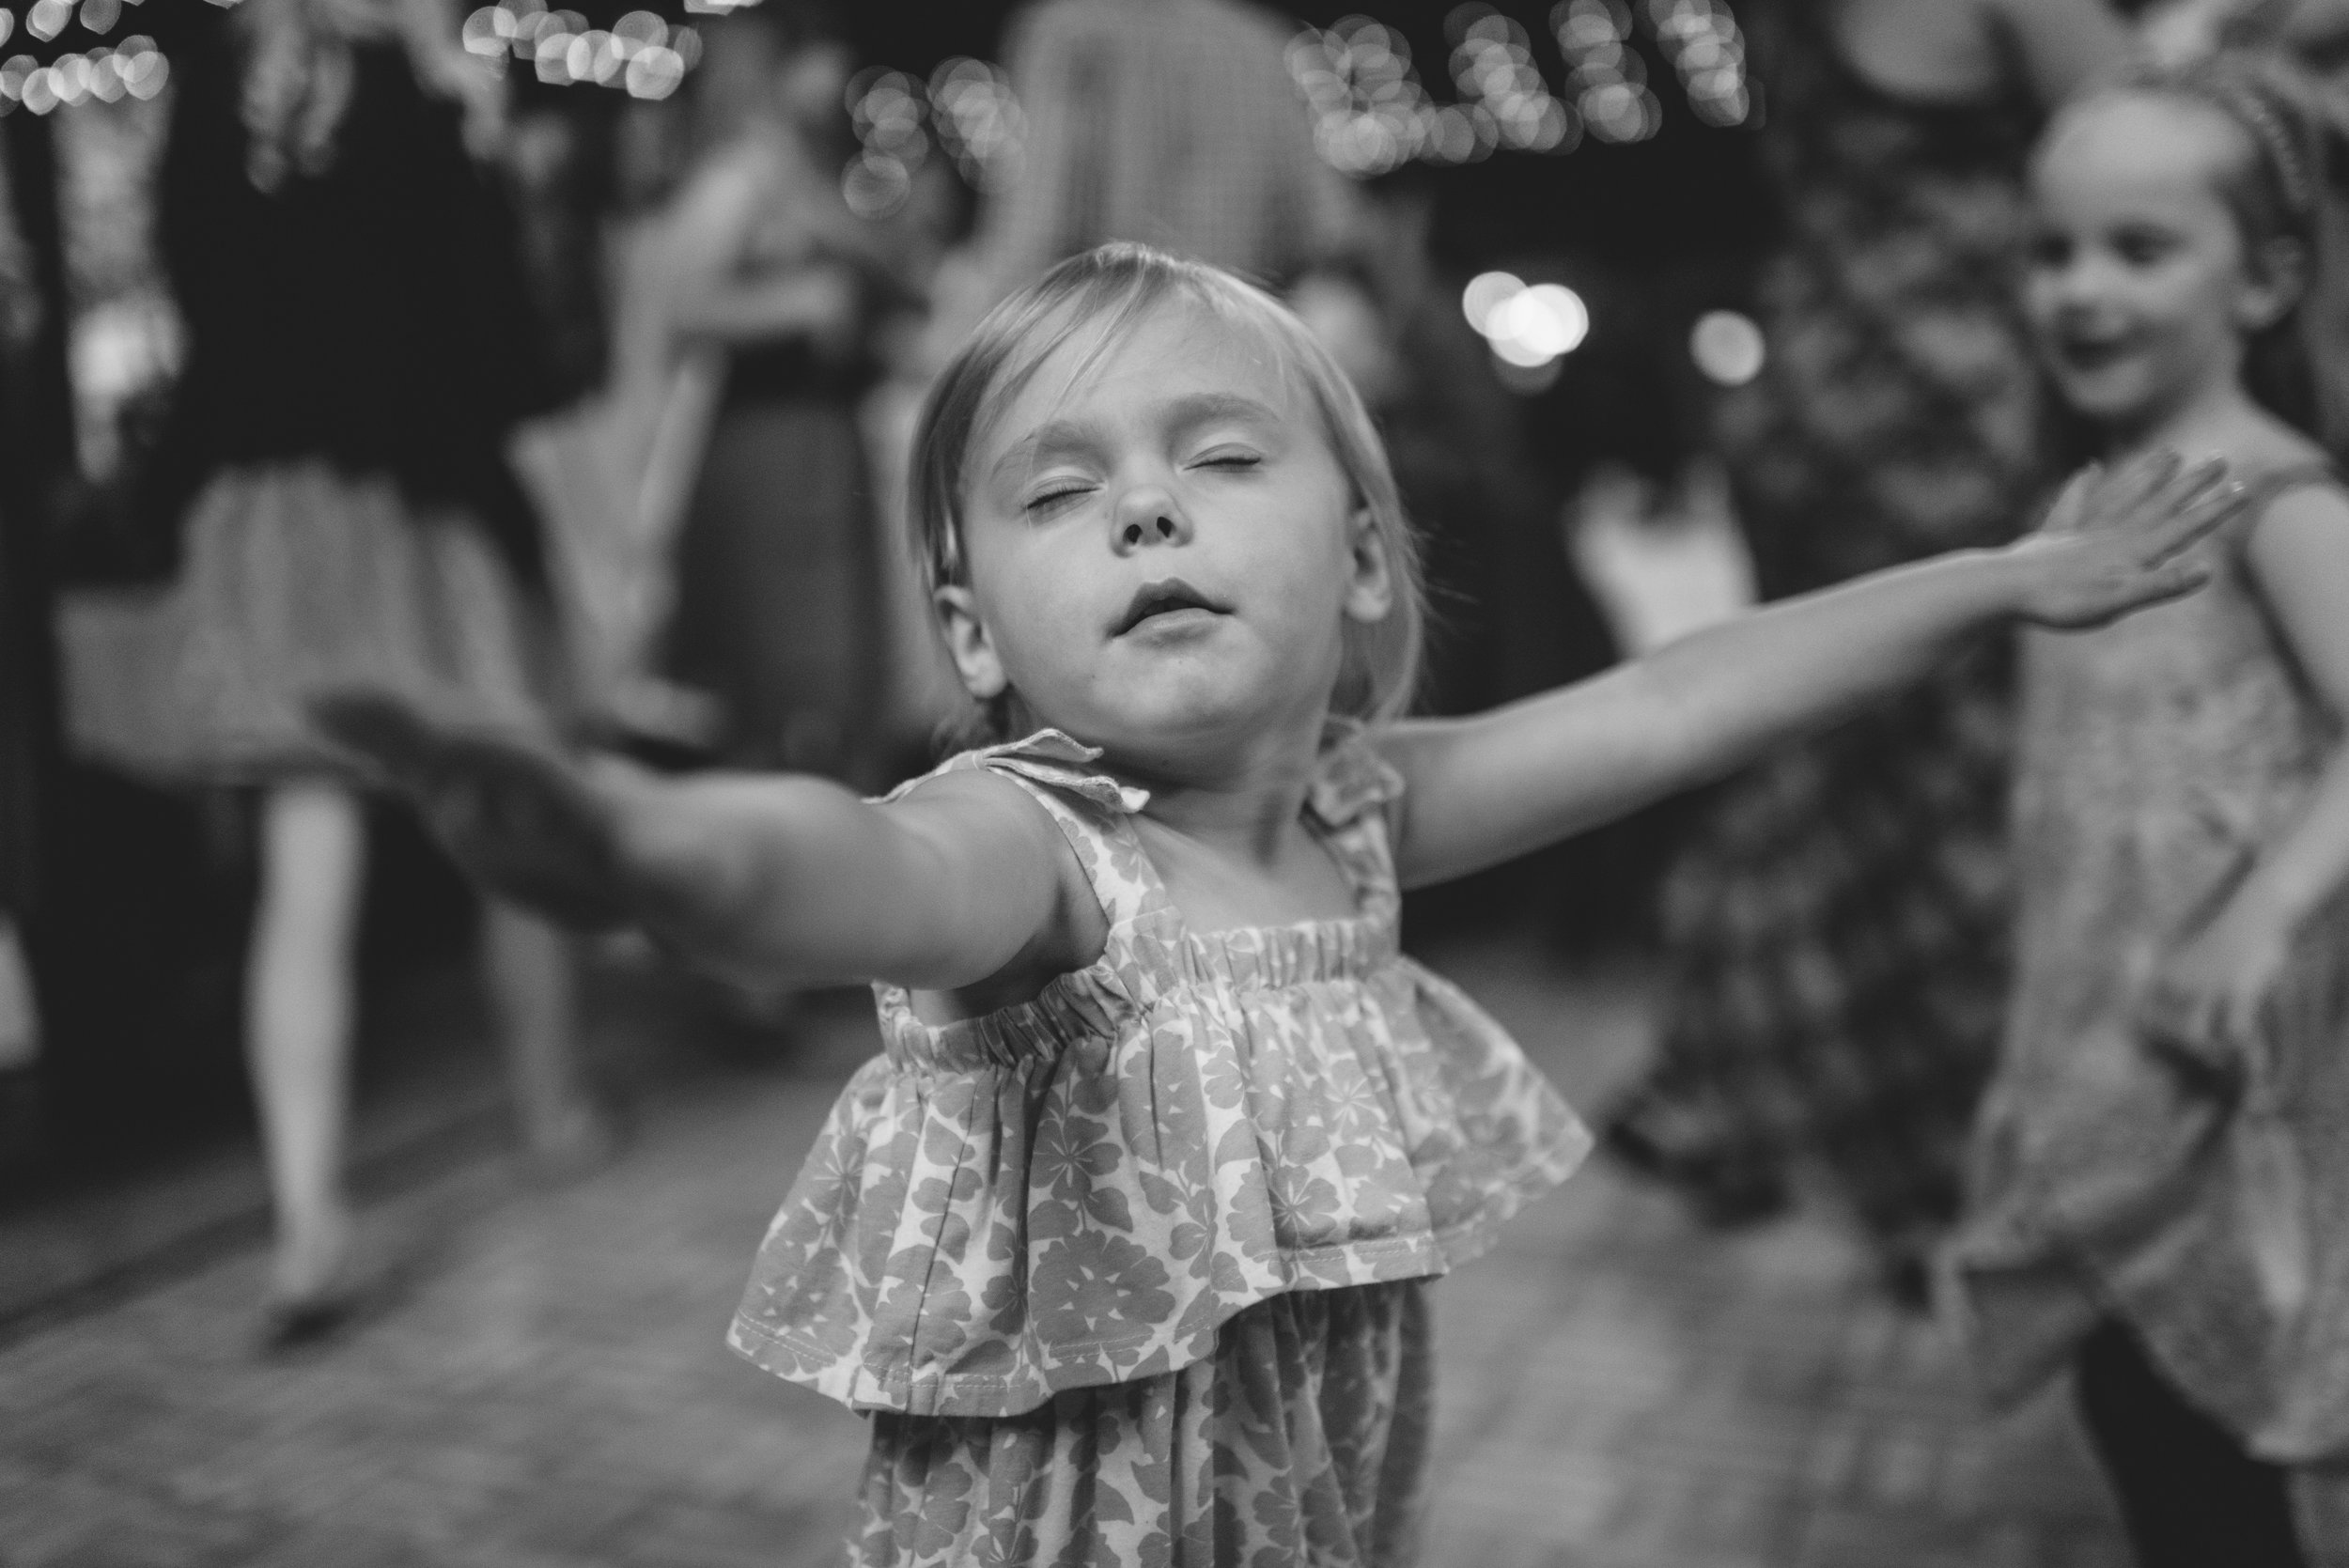 walton_dancing_09.jpg